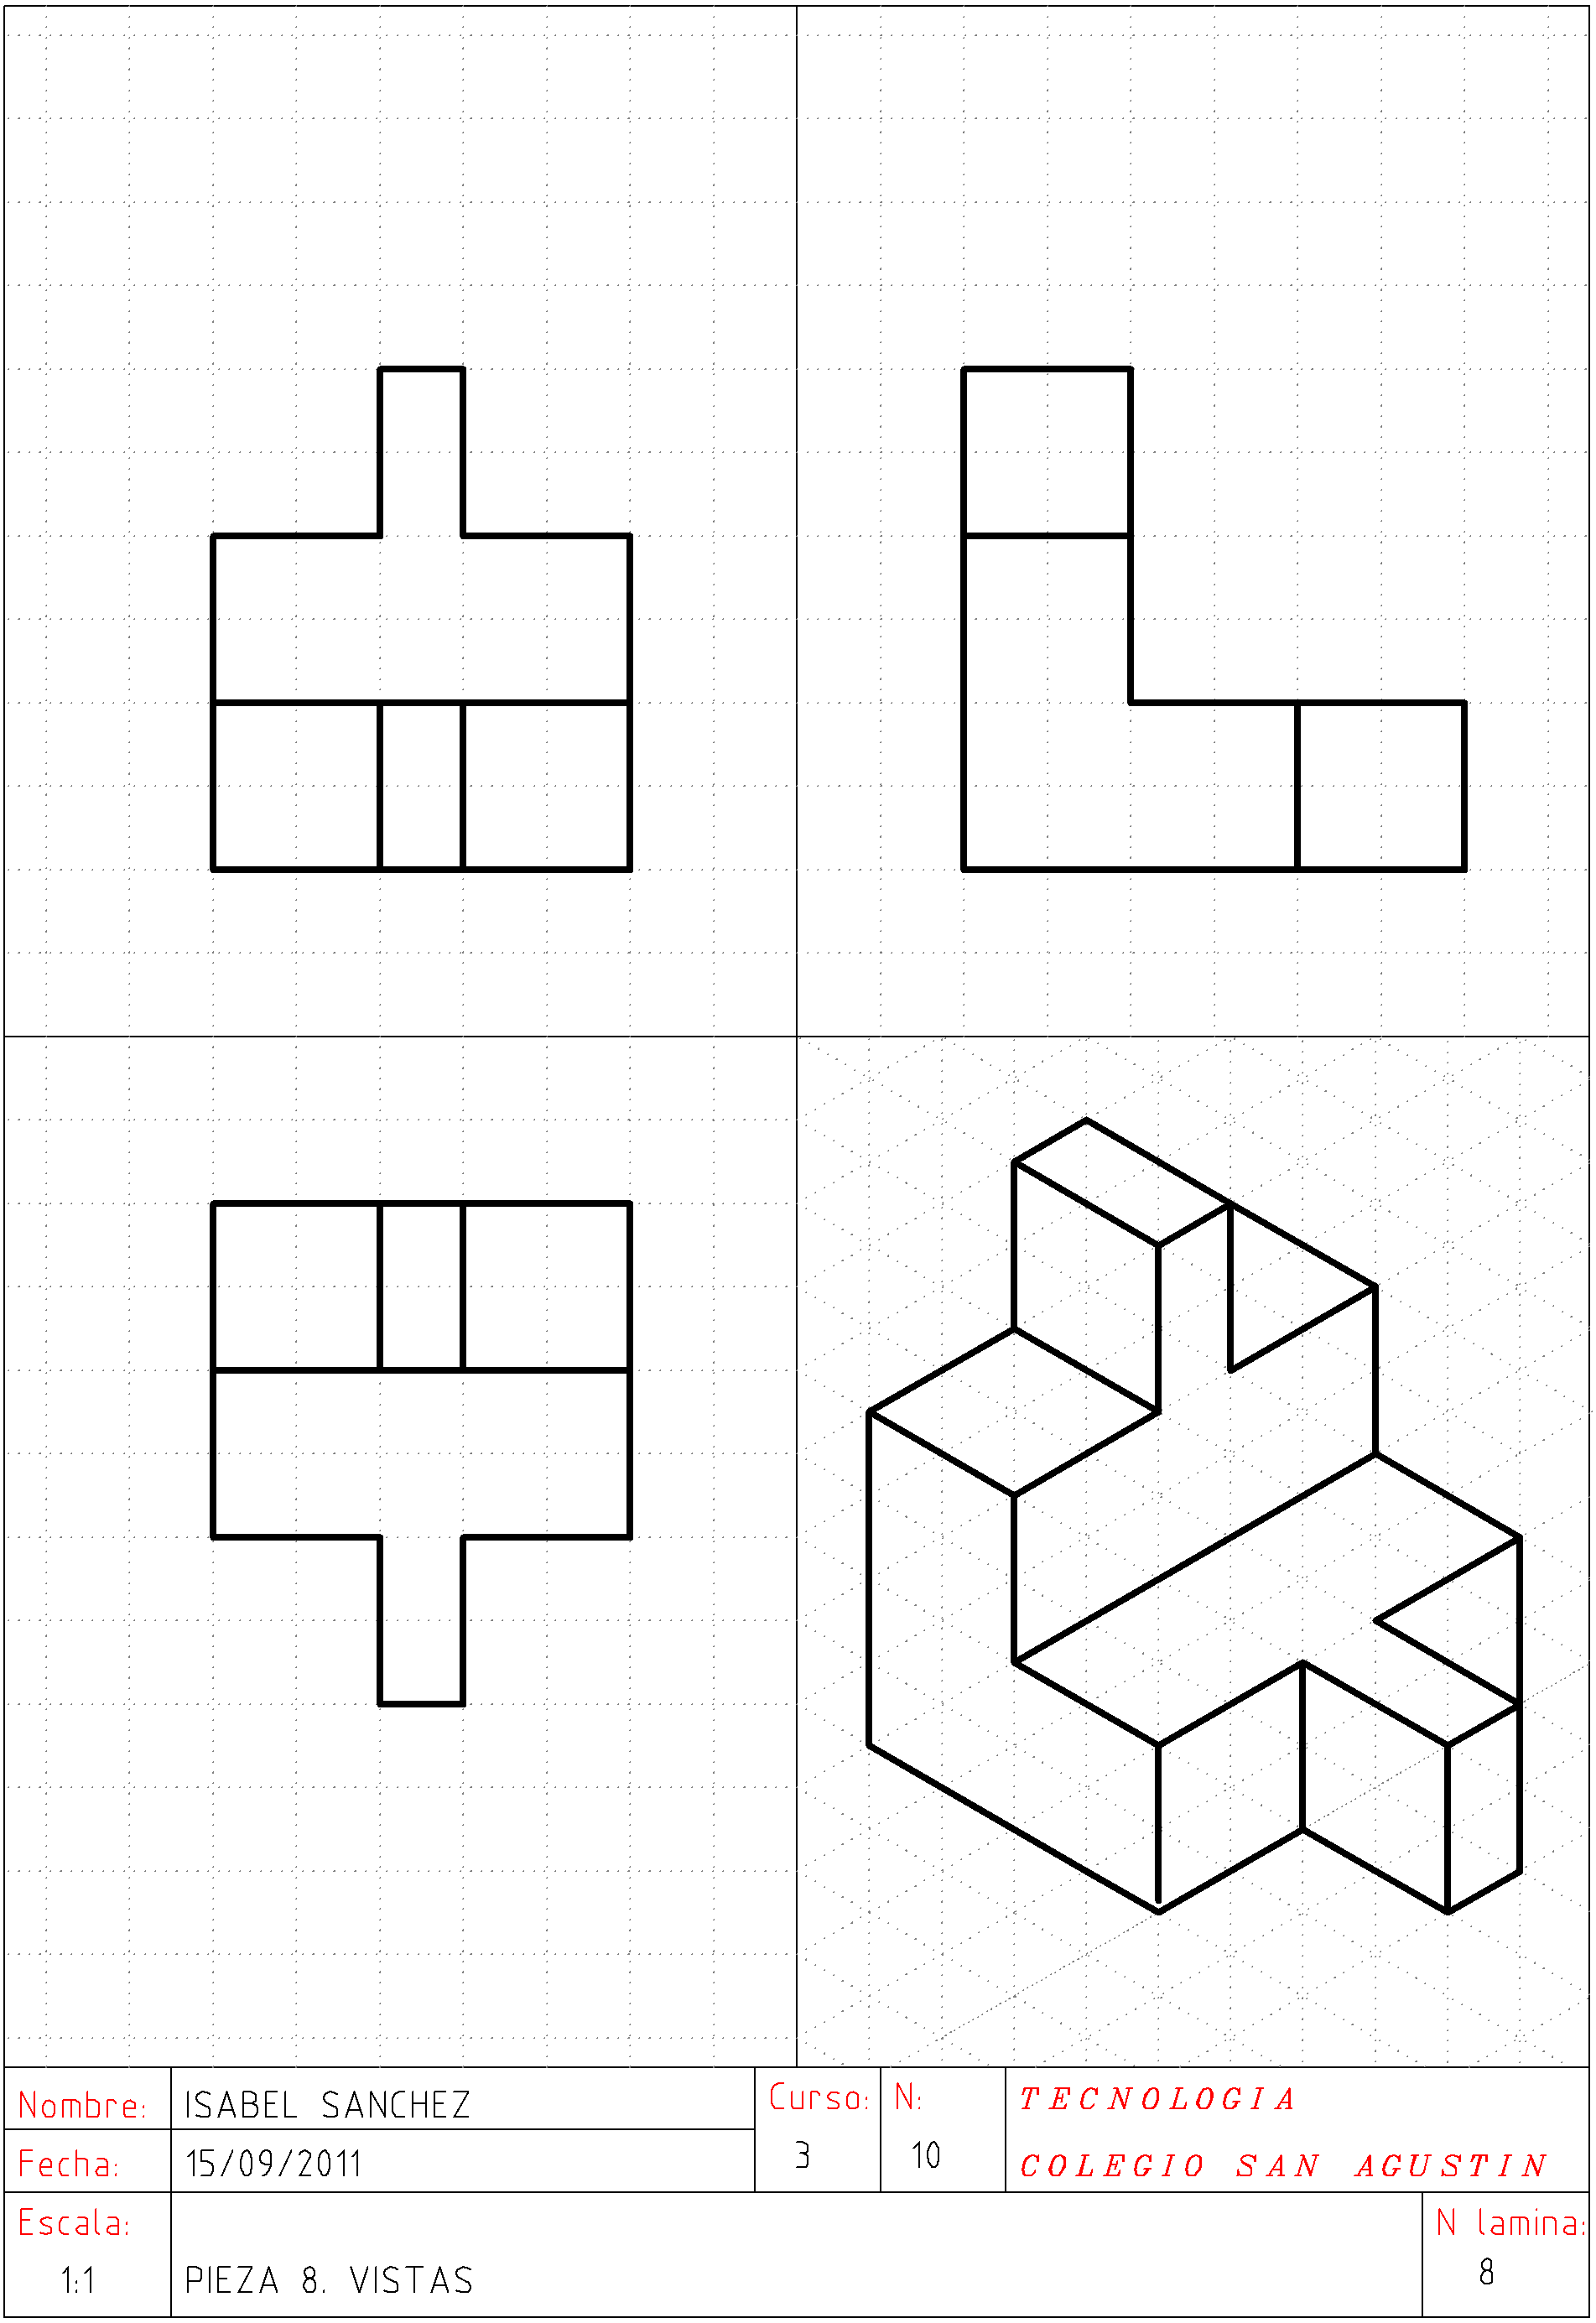 Imagen Relacionada Tecnicas De Dibujo Vistas Dibujo Tecnico Clases De Dibujo